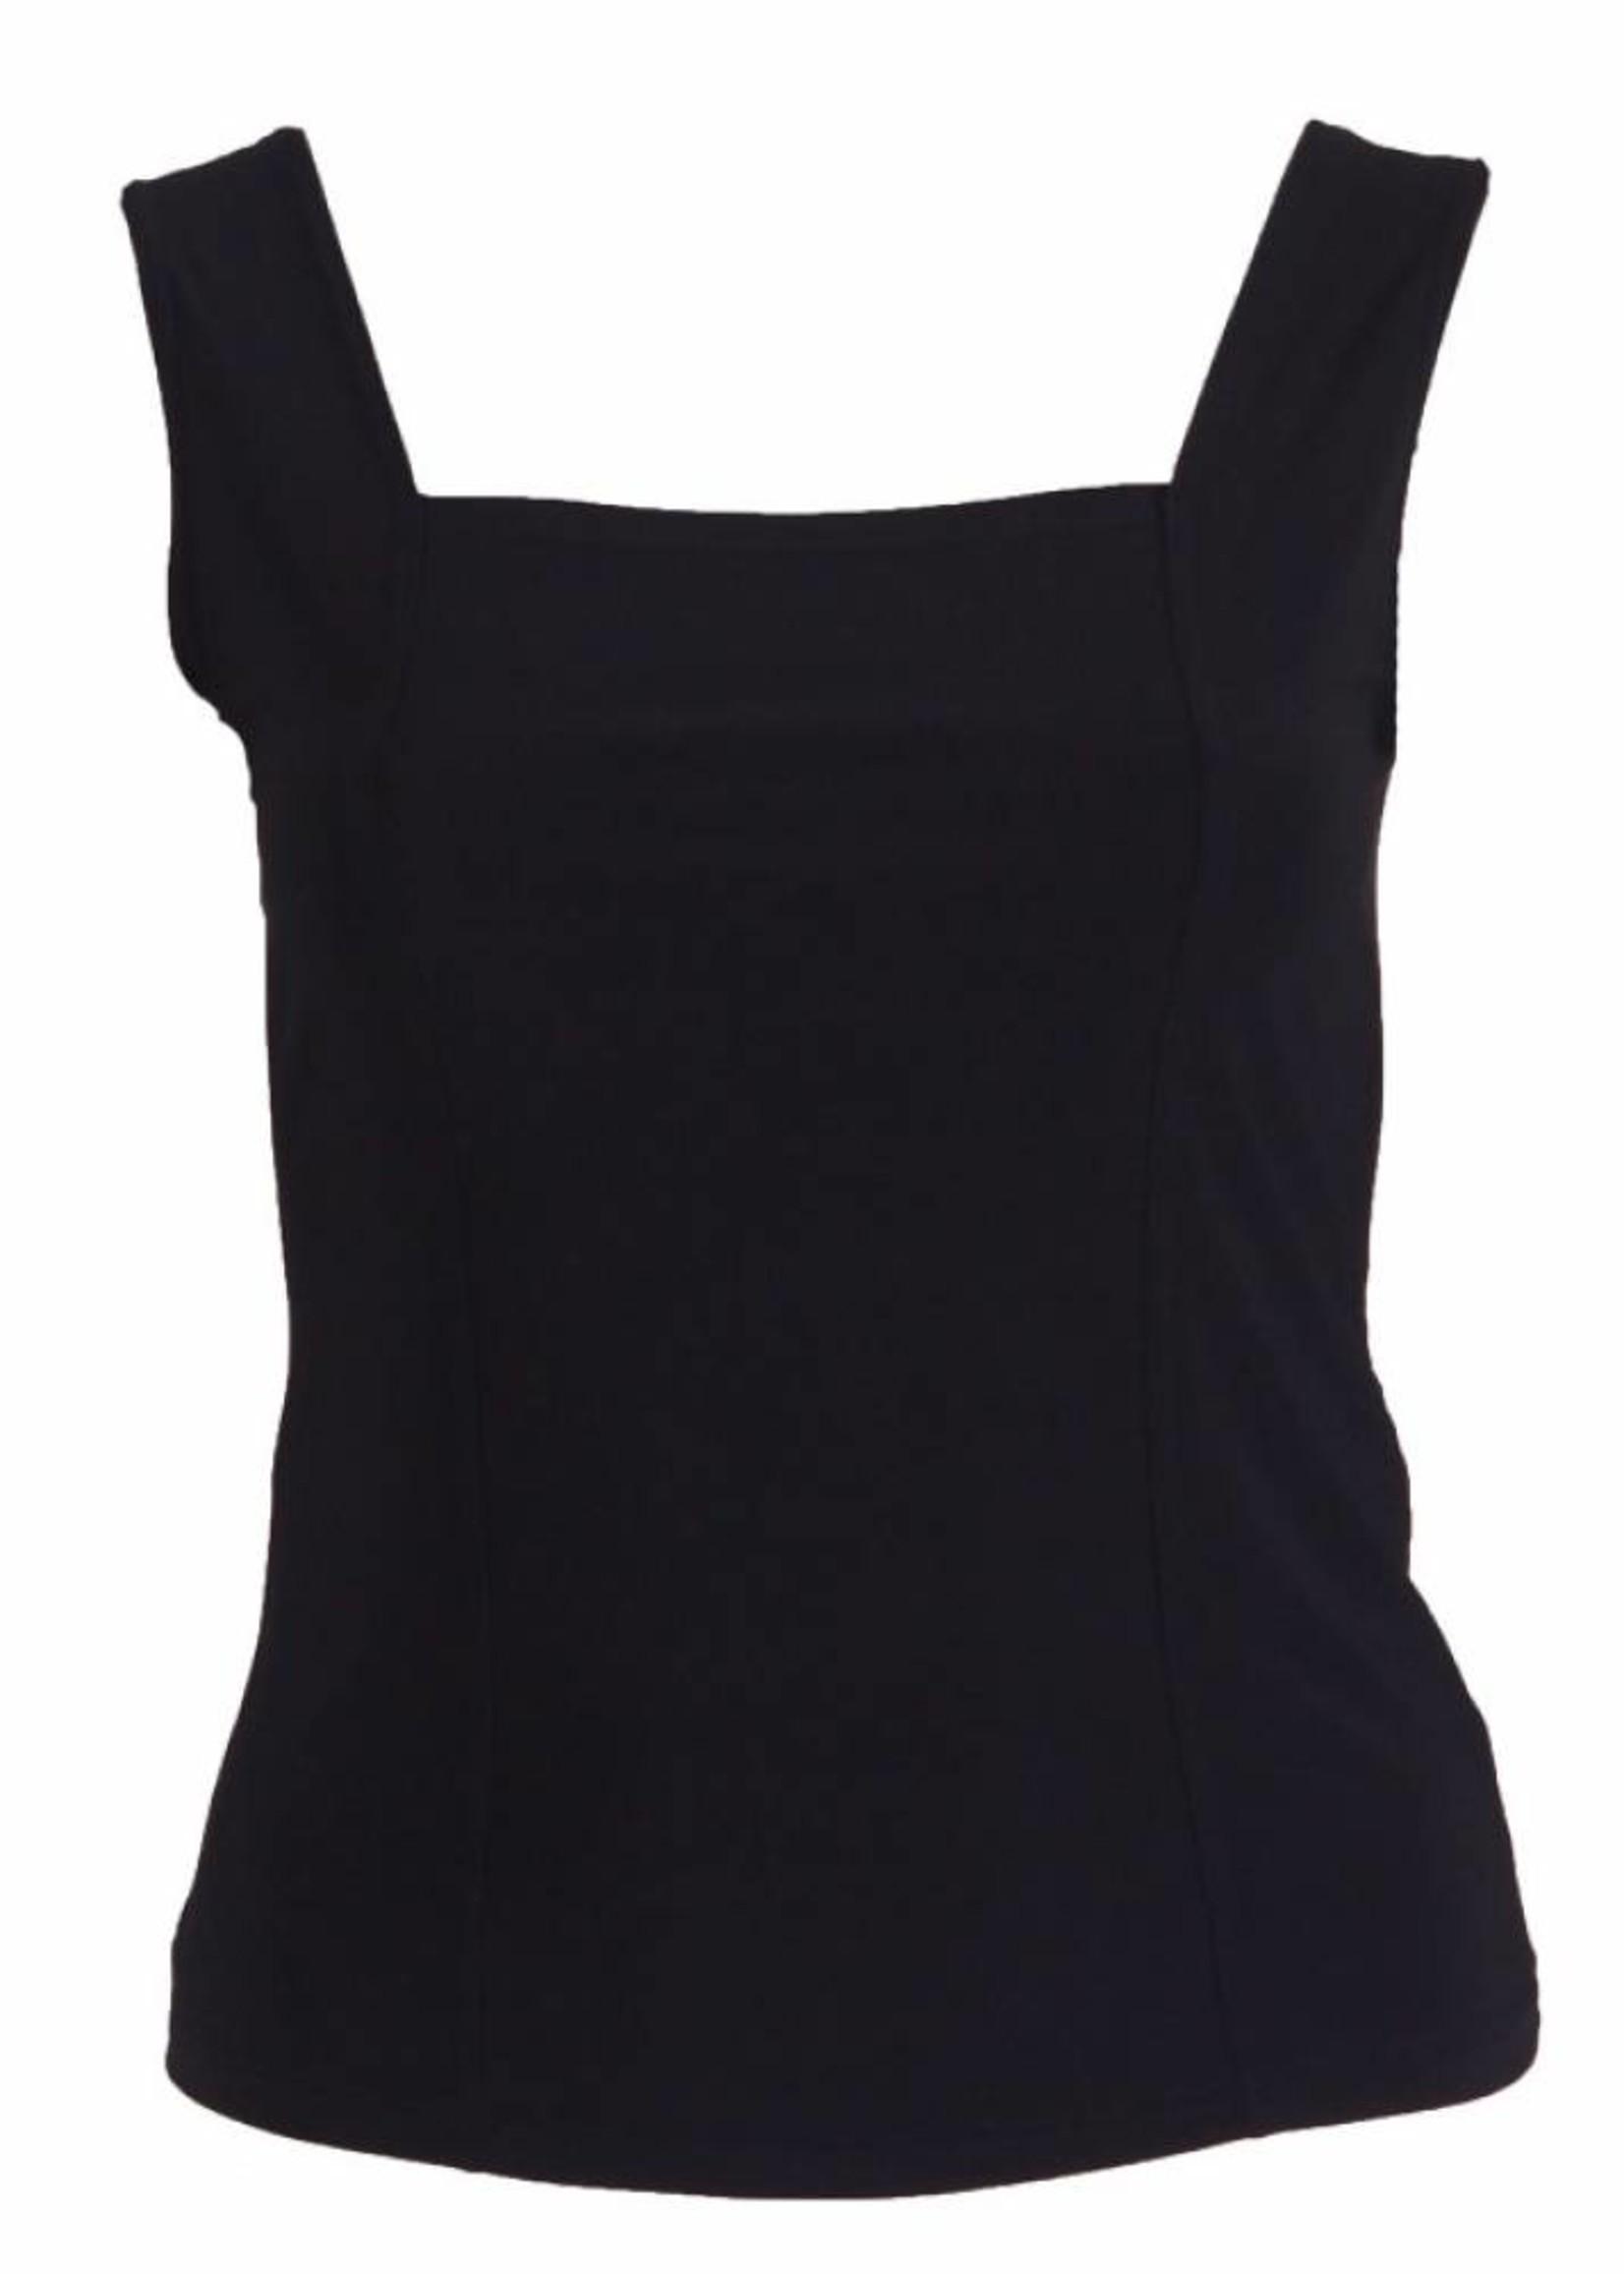 Magna Fashion Top A14 SOLID BASIS